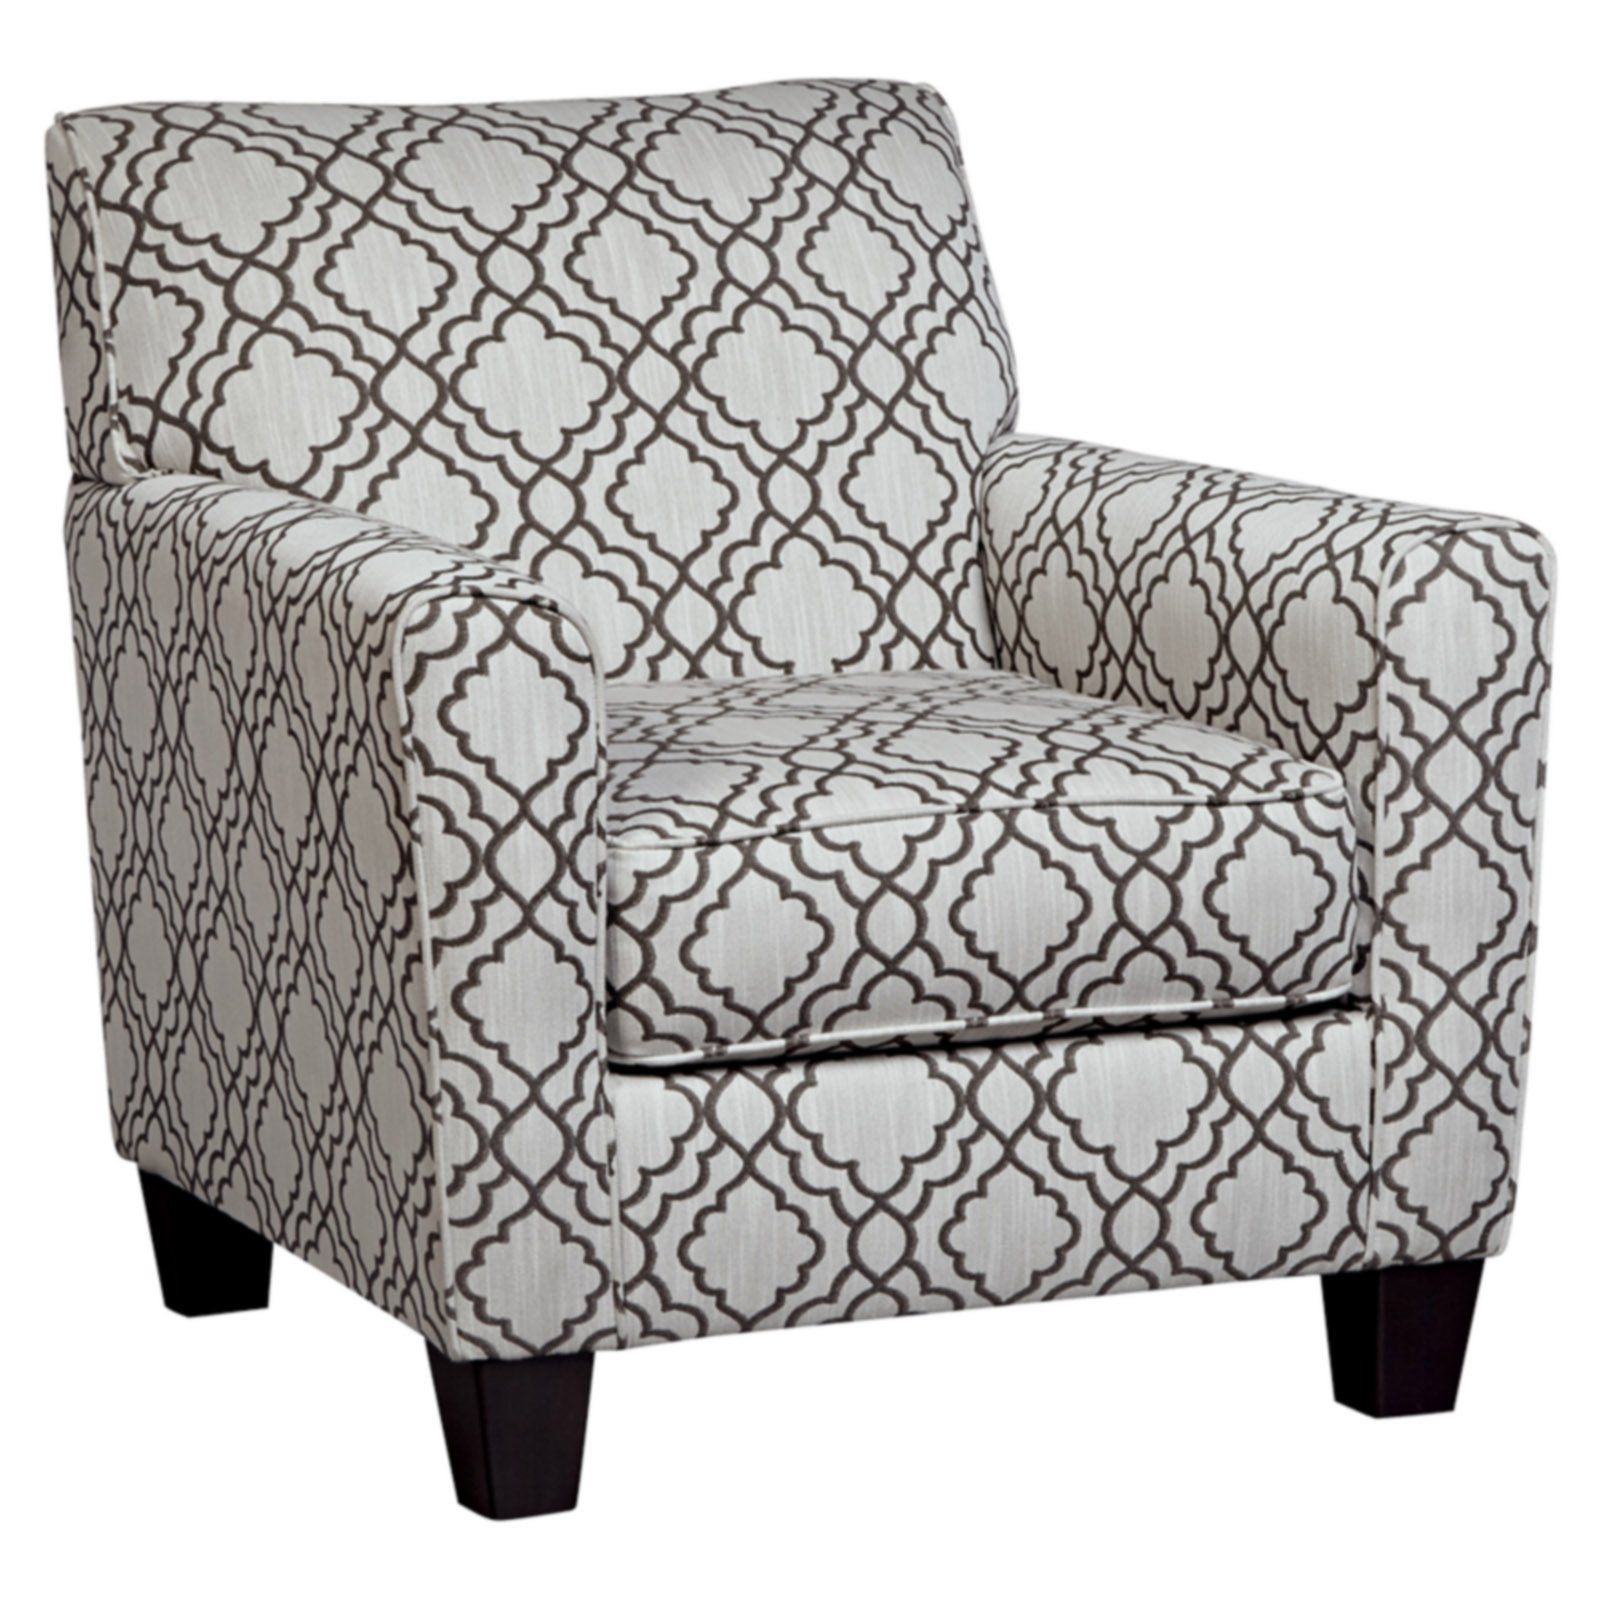 Signature Design By Ashley Farouh Accent Club Chair Ashley Furniture Chairs Furniture Chair